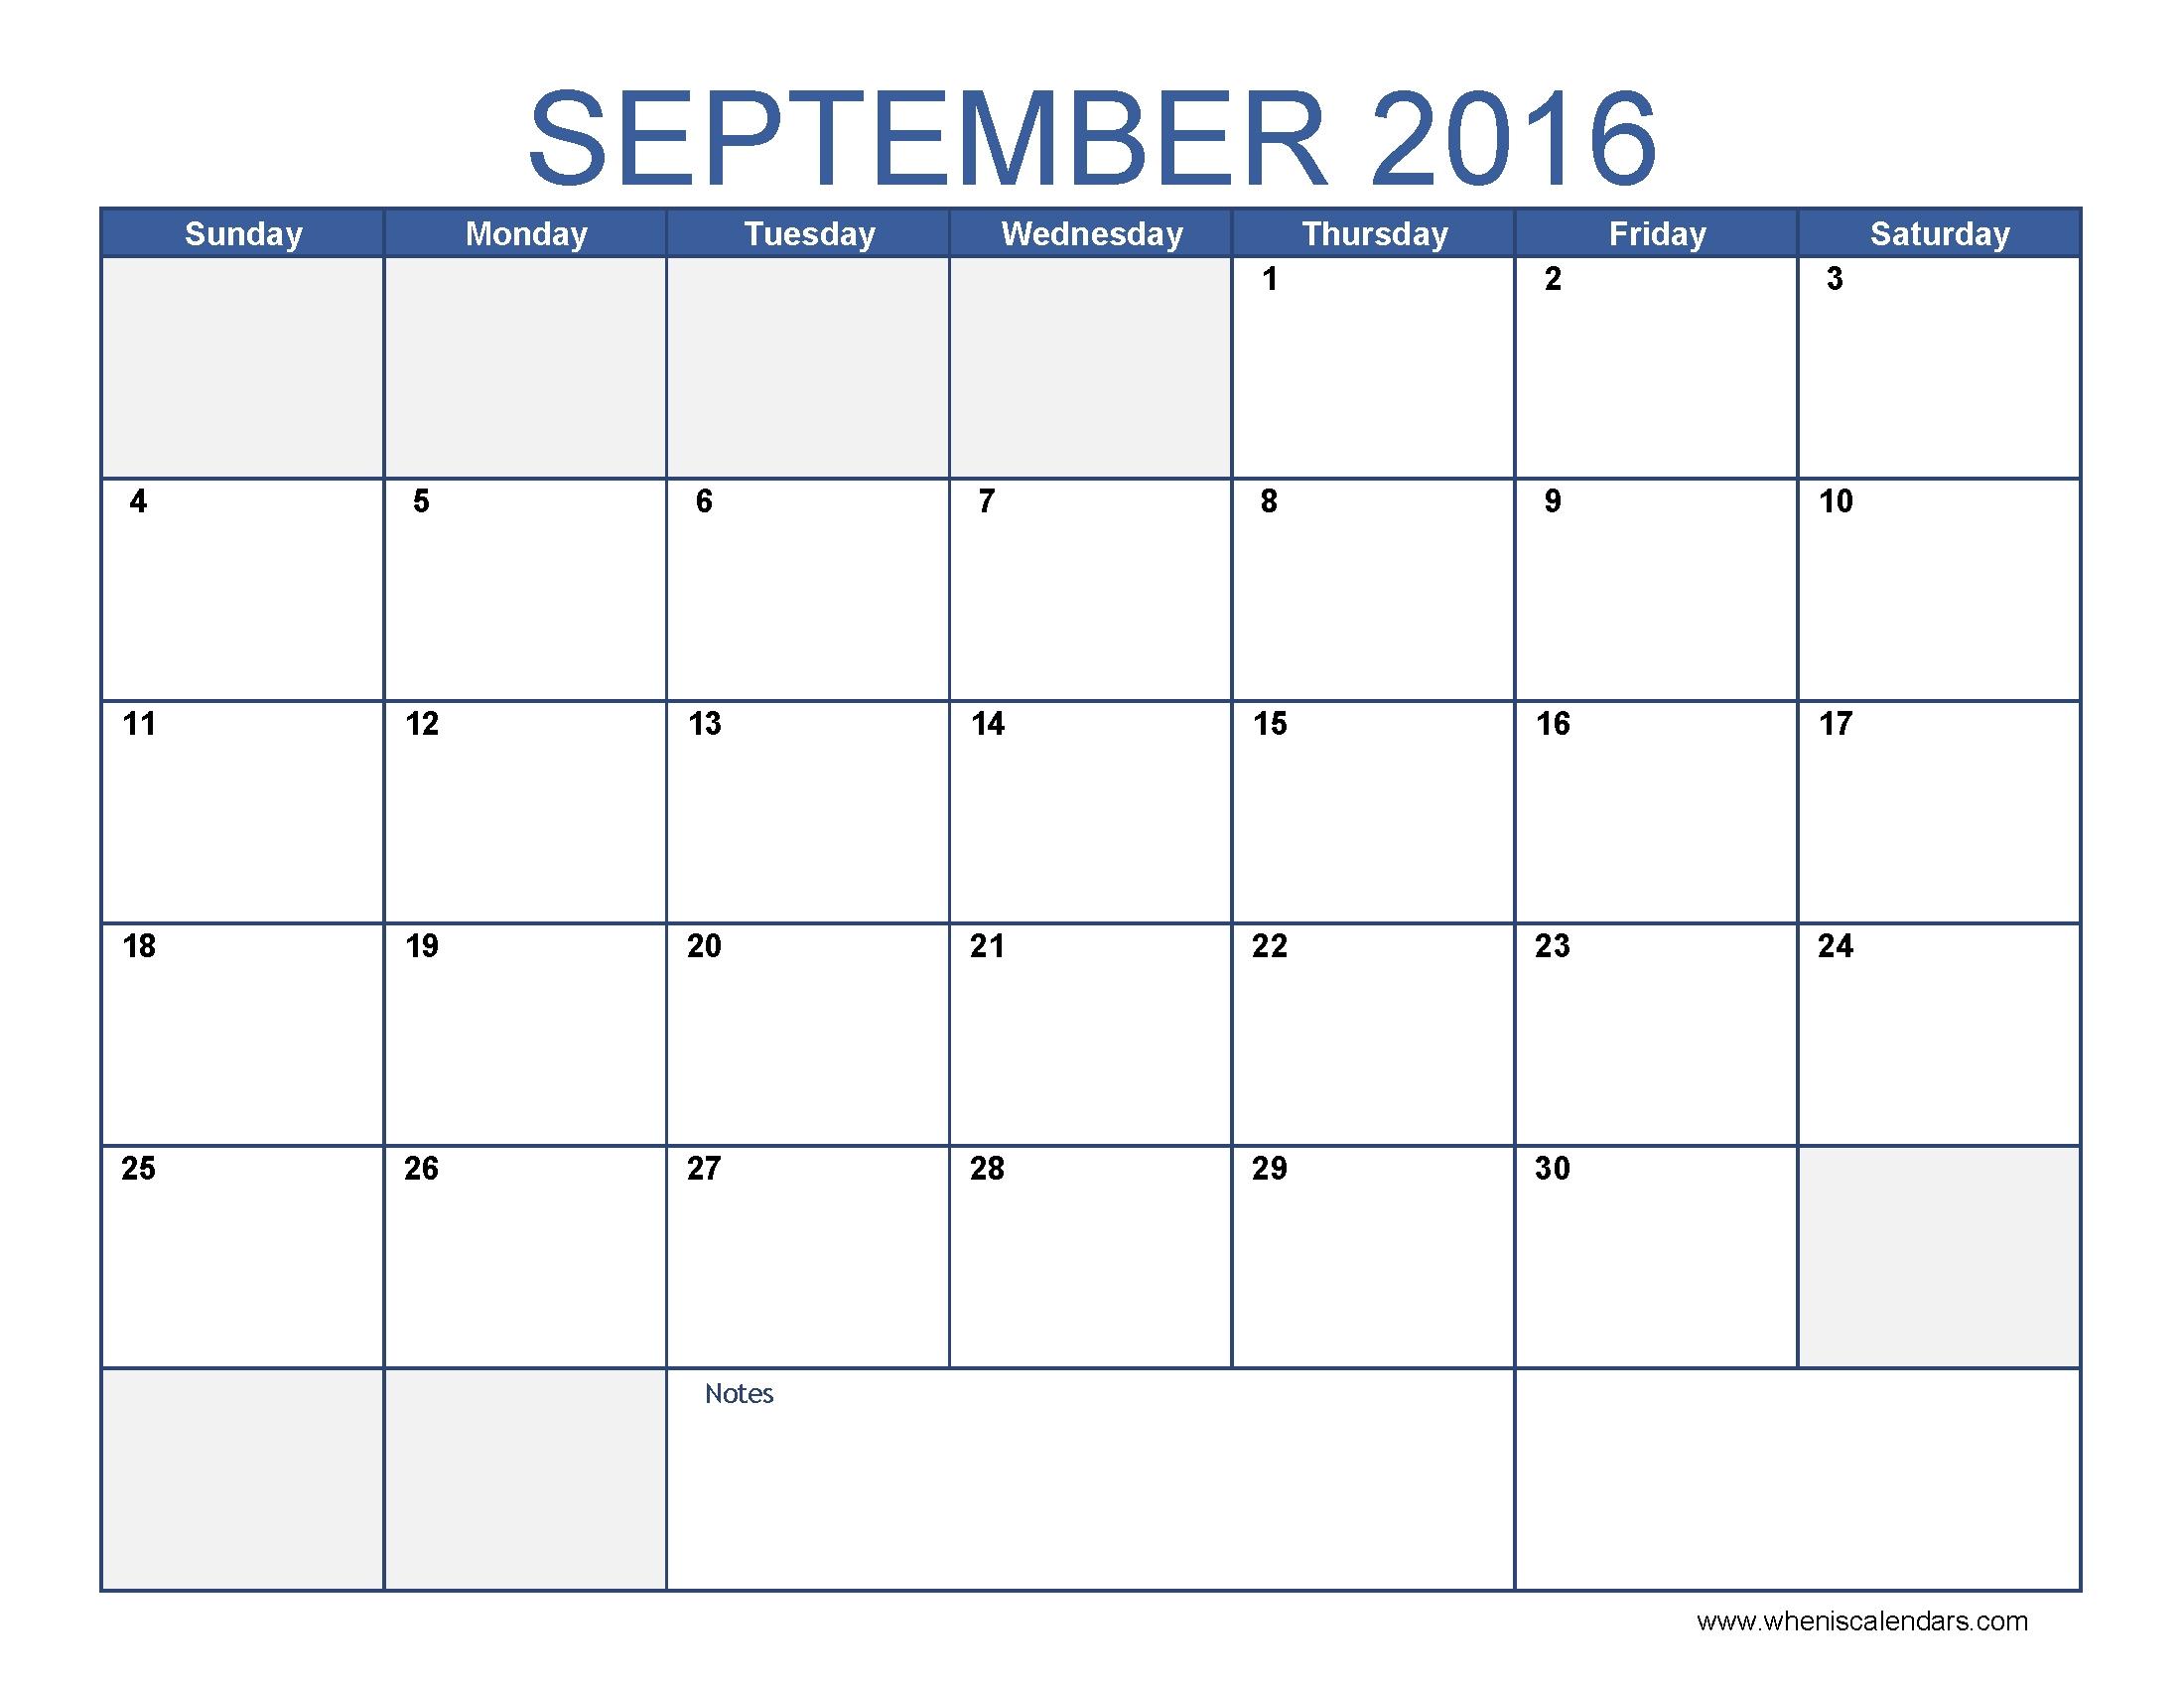 September 2016 Calendar Excel #september2016 #excelcalendar throughout Calendar For Month Of September